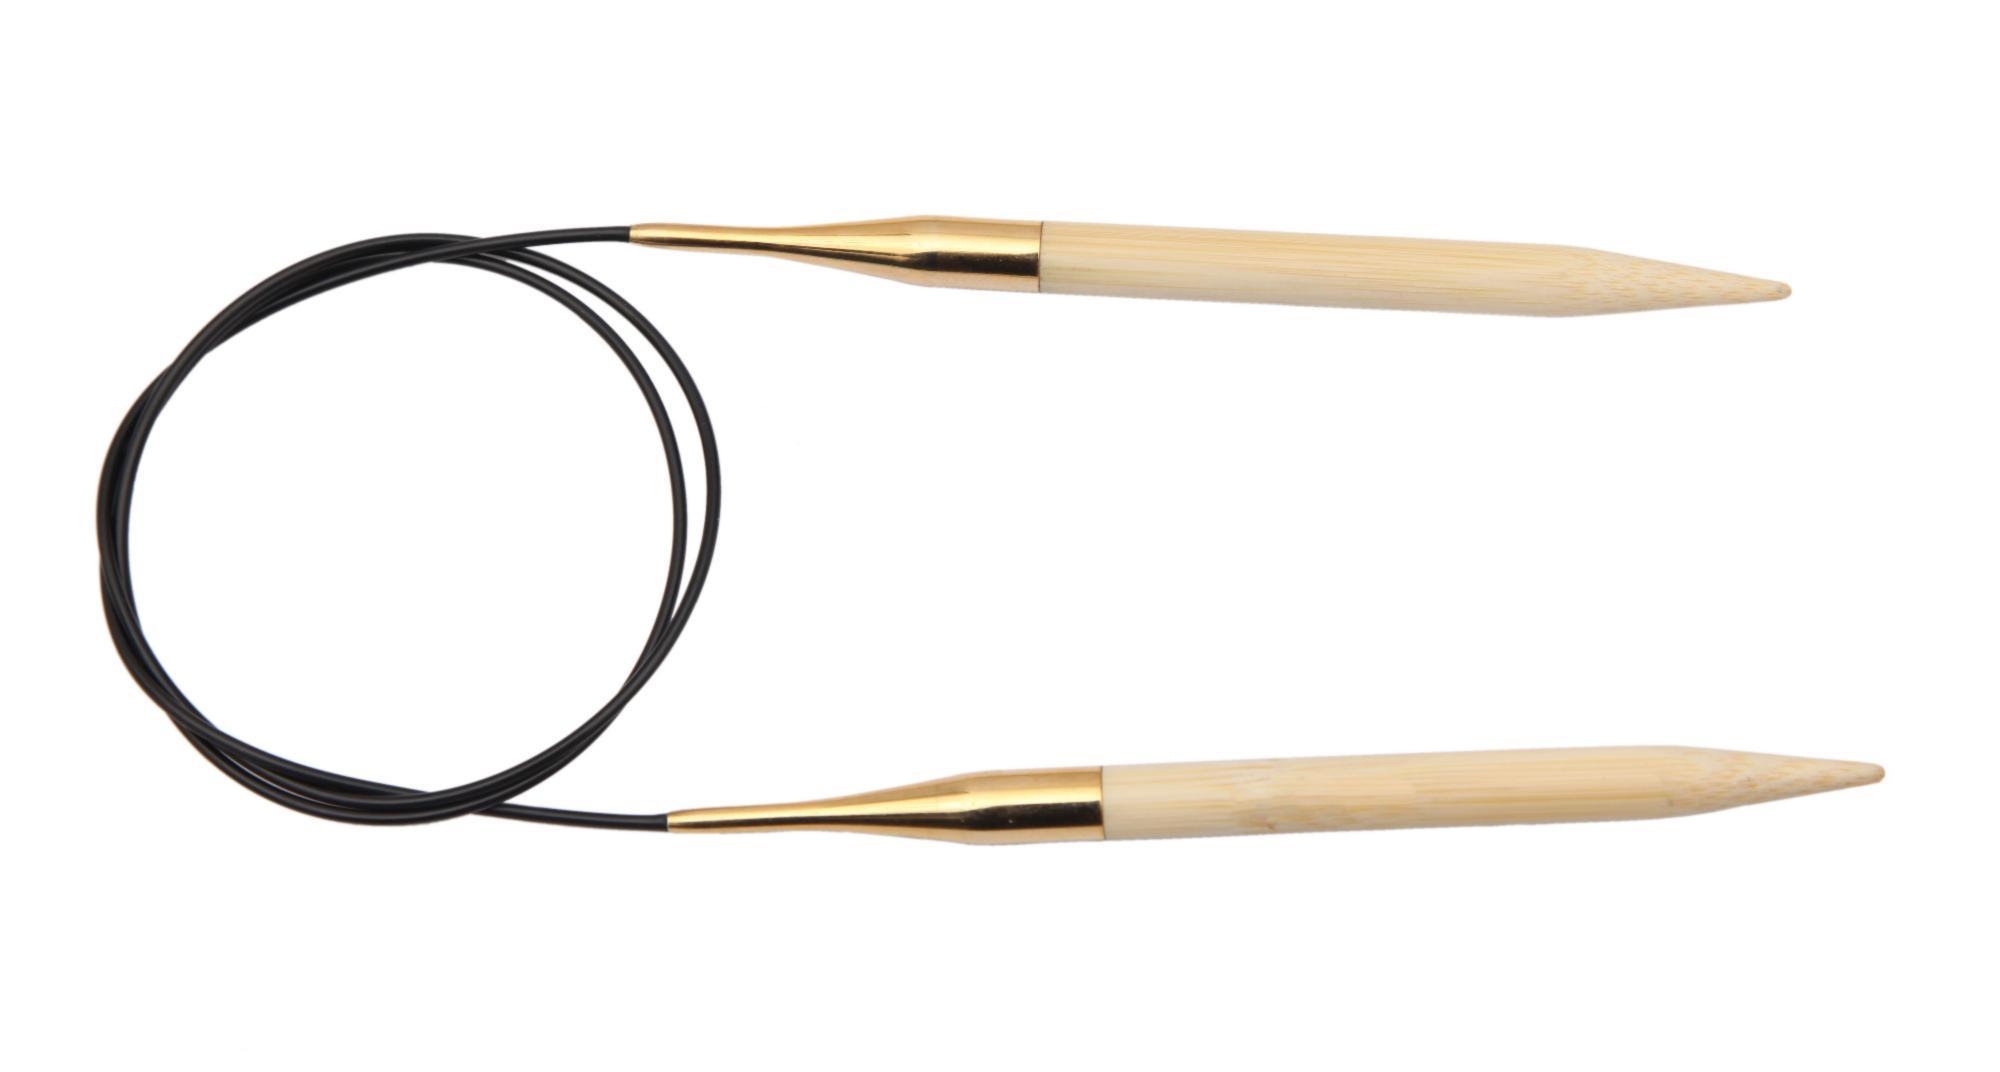 Спицы круговые 80 см Bamboo KnitPro, 22246, 3.50 мм